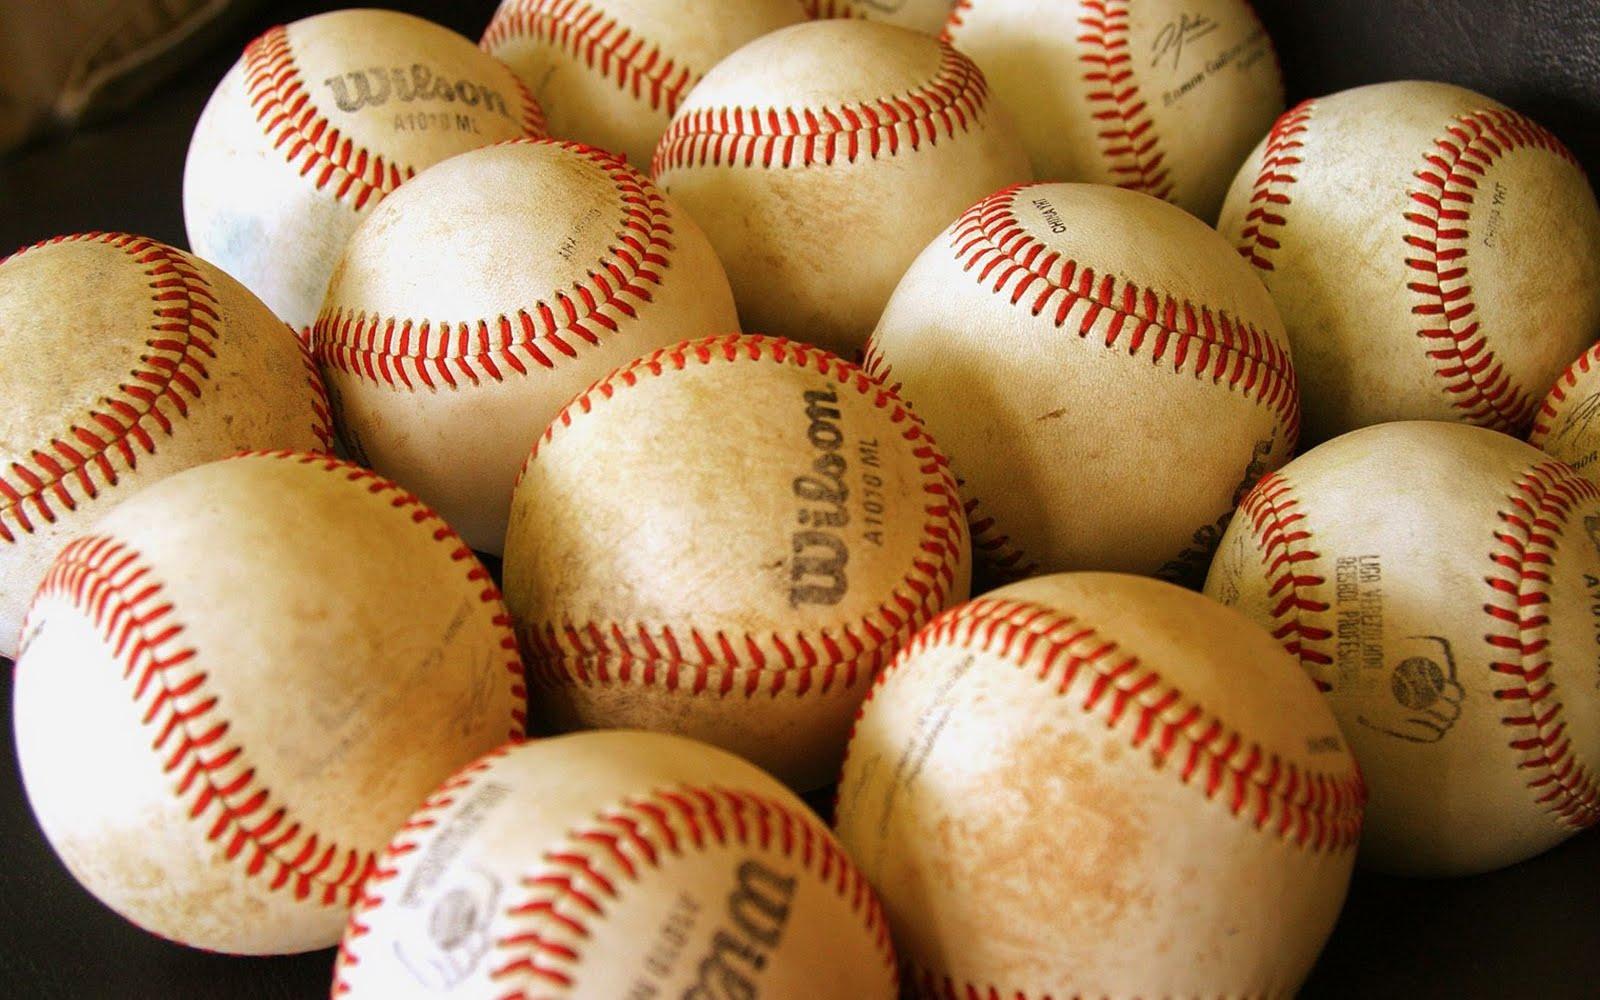 Hd baseball wallpapersCool baseball wallpapersBaseball wallpapers 1600x1000